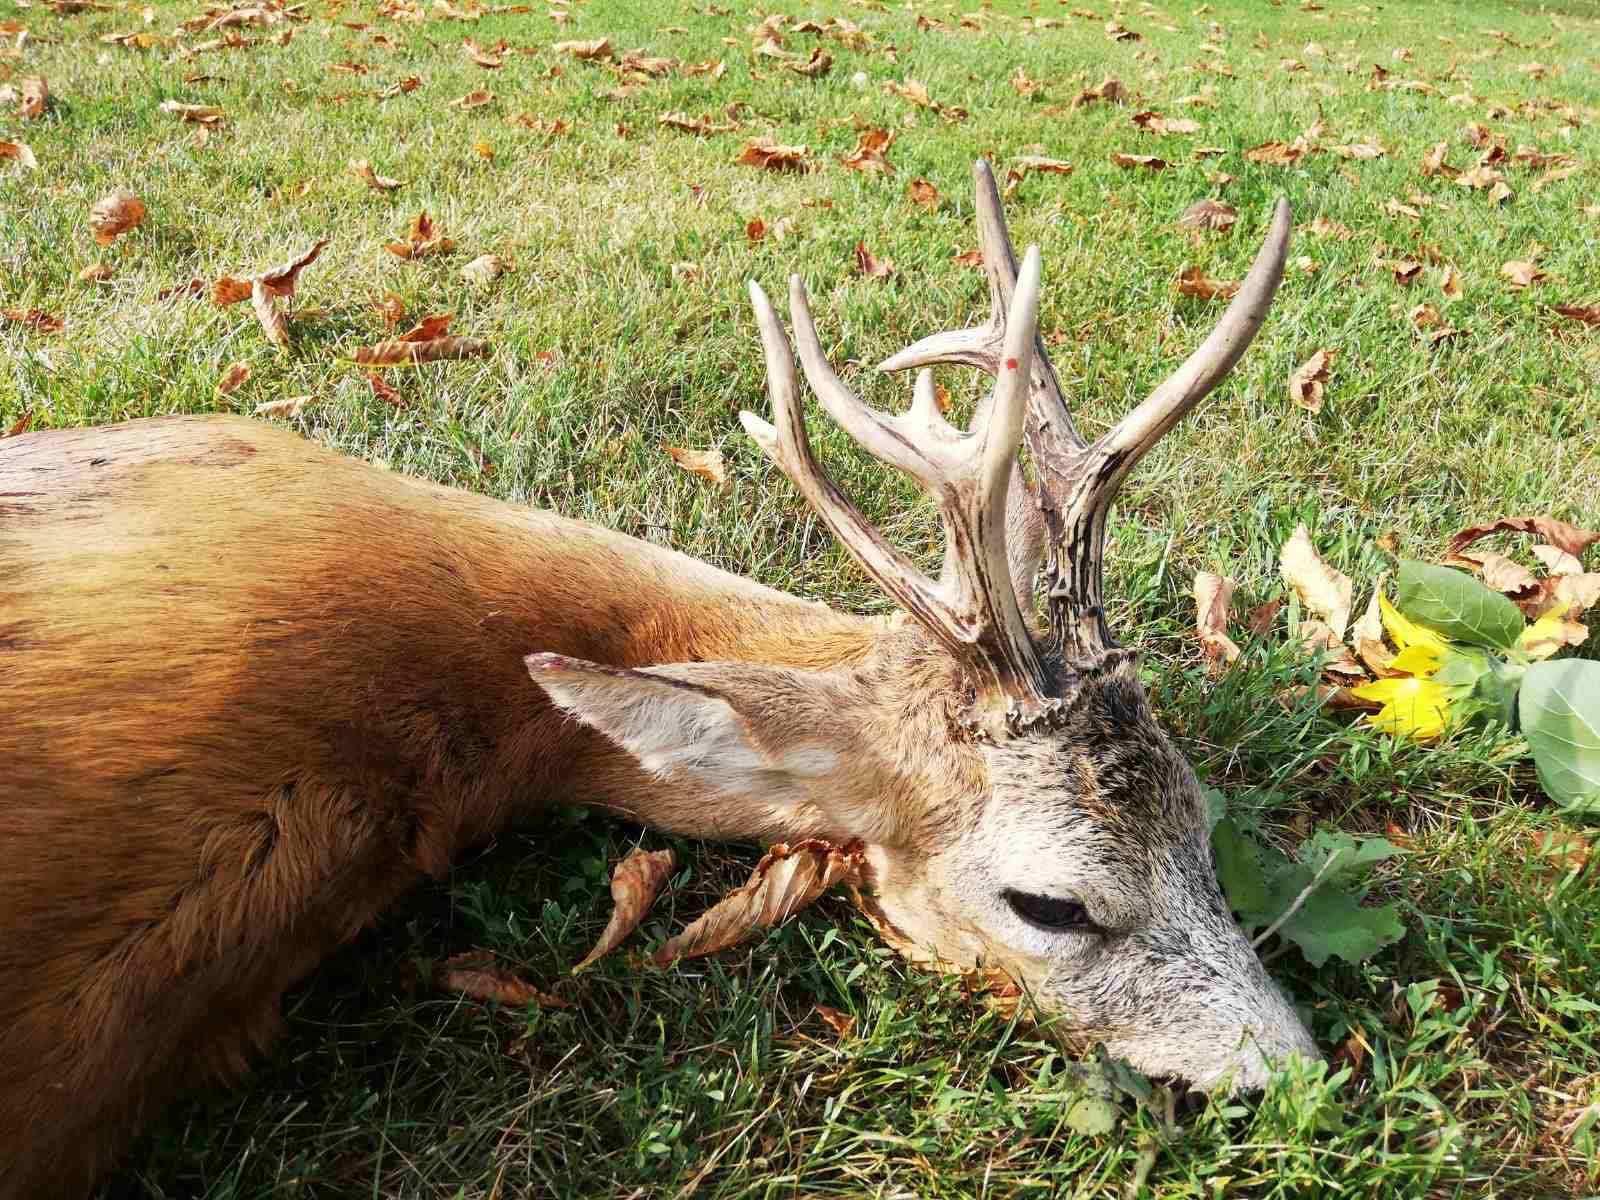 Újvilág Hunting company